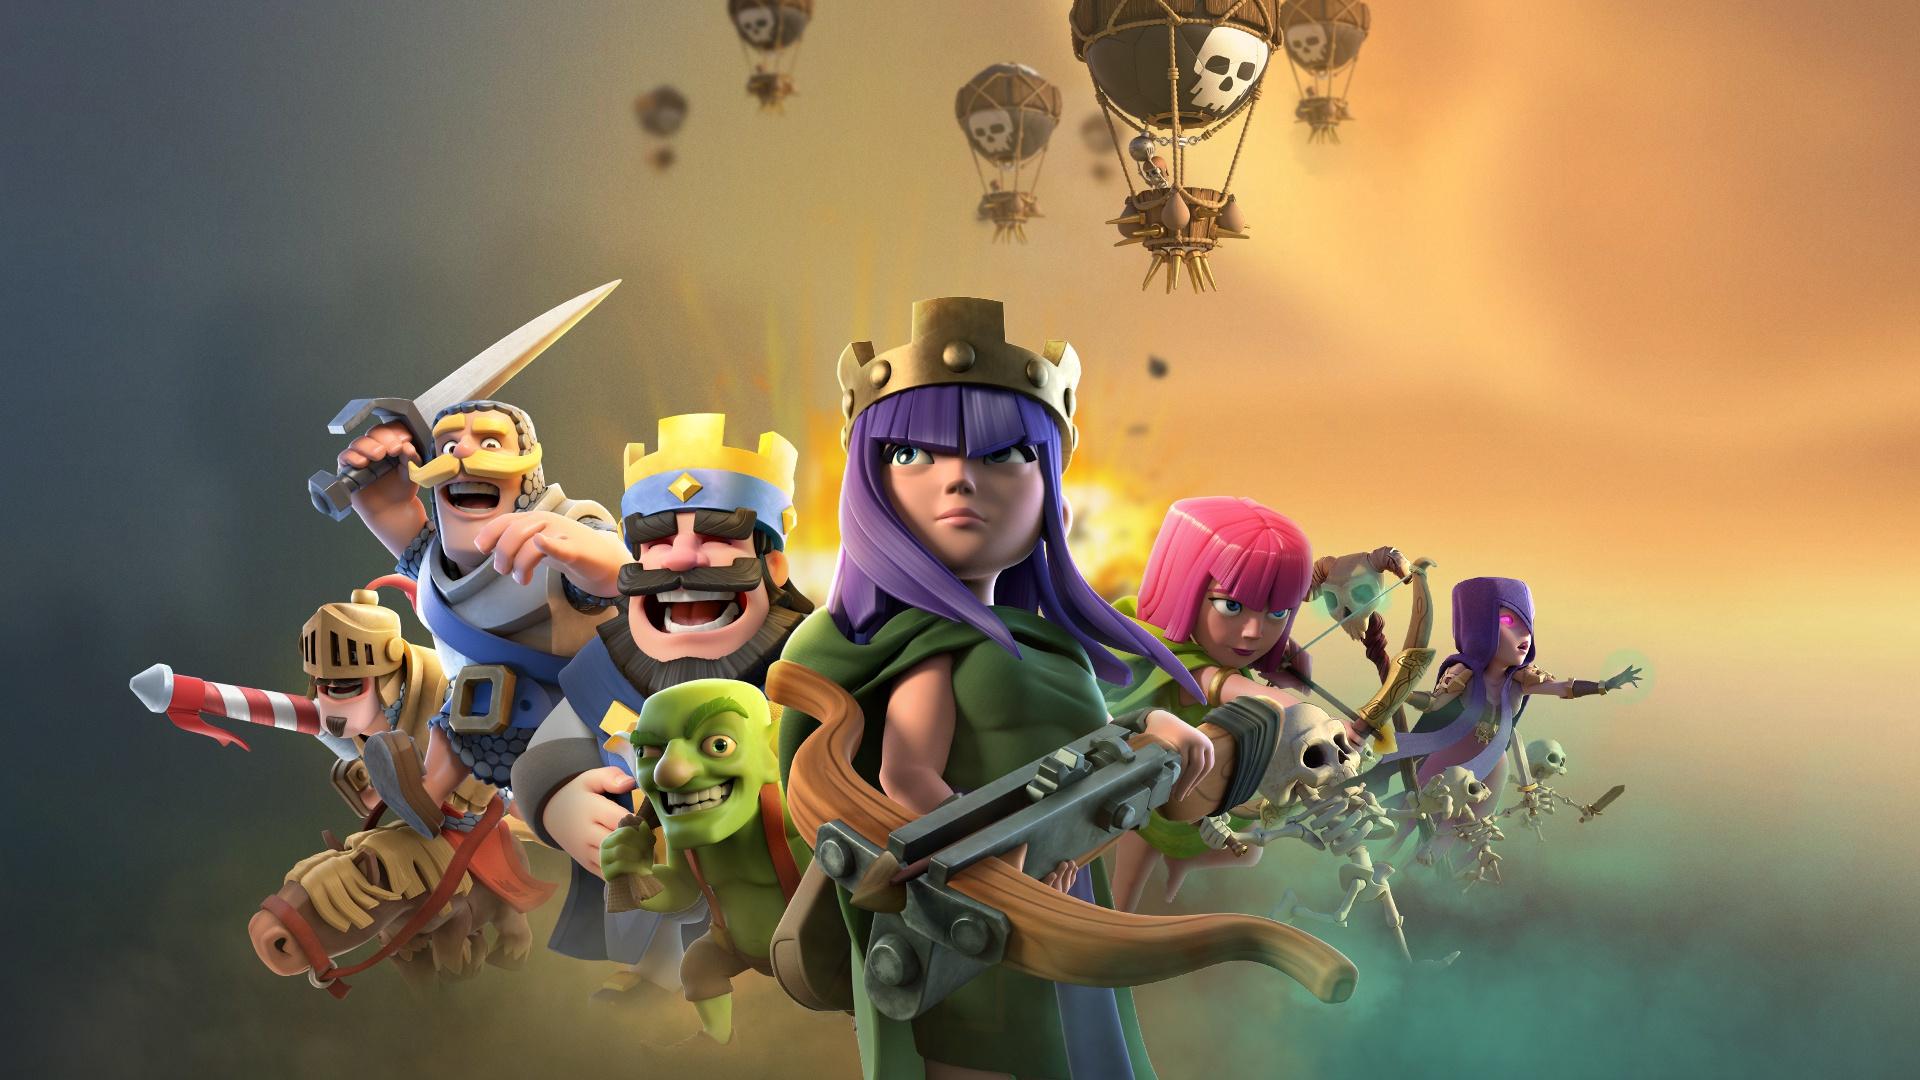 Barbarian Clash Of Clans Hd Hd Games 4k Wallpapers: Desktop Wallpaper Clash Of Clans, Mobile Game, Archer